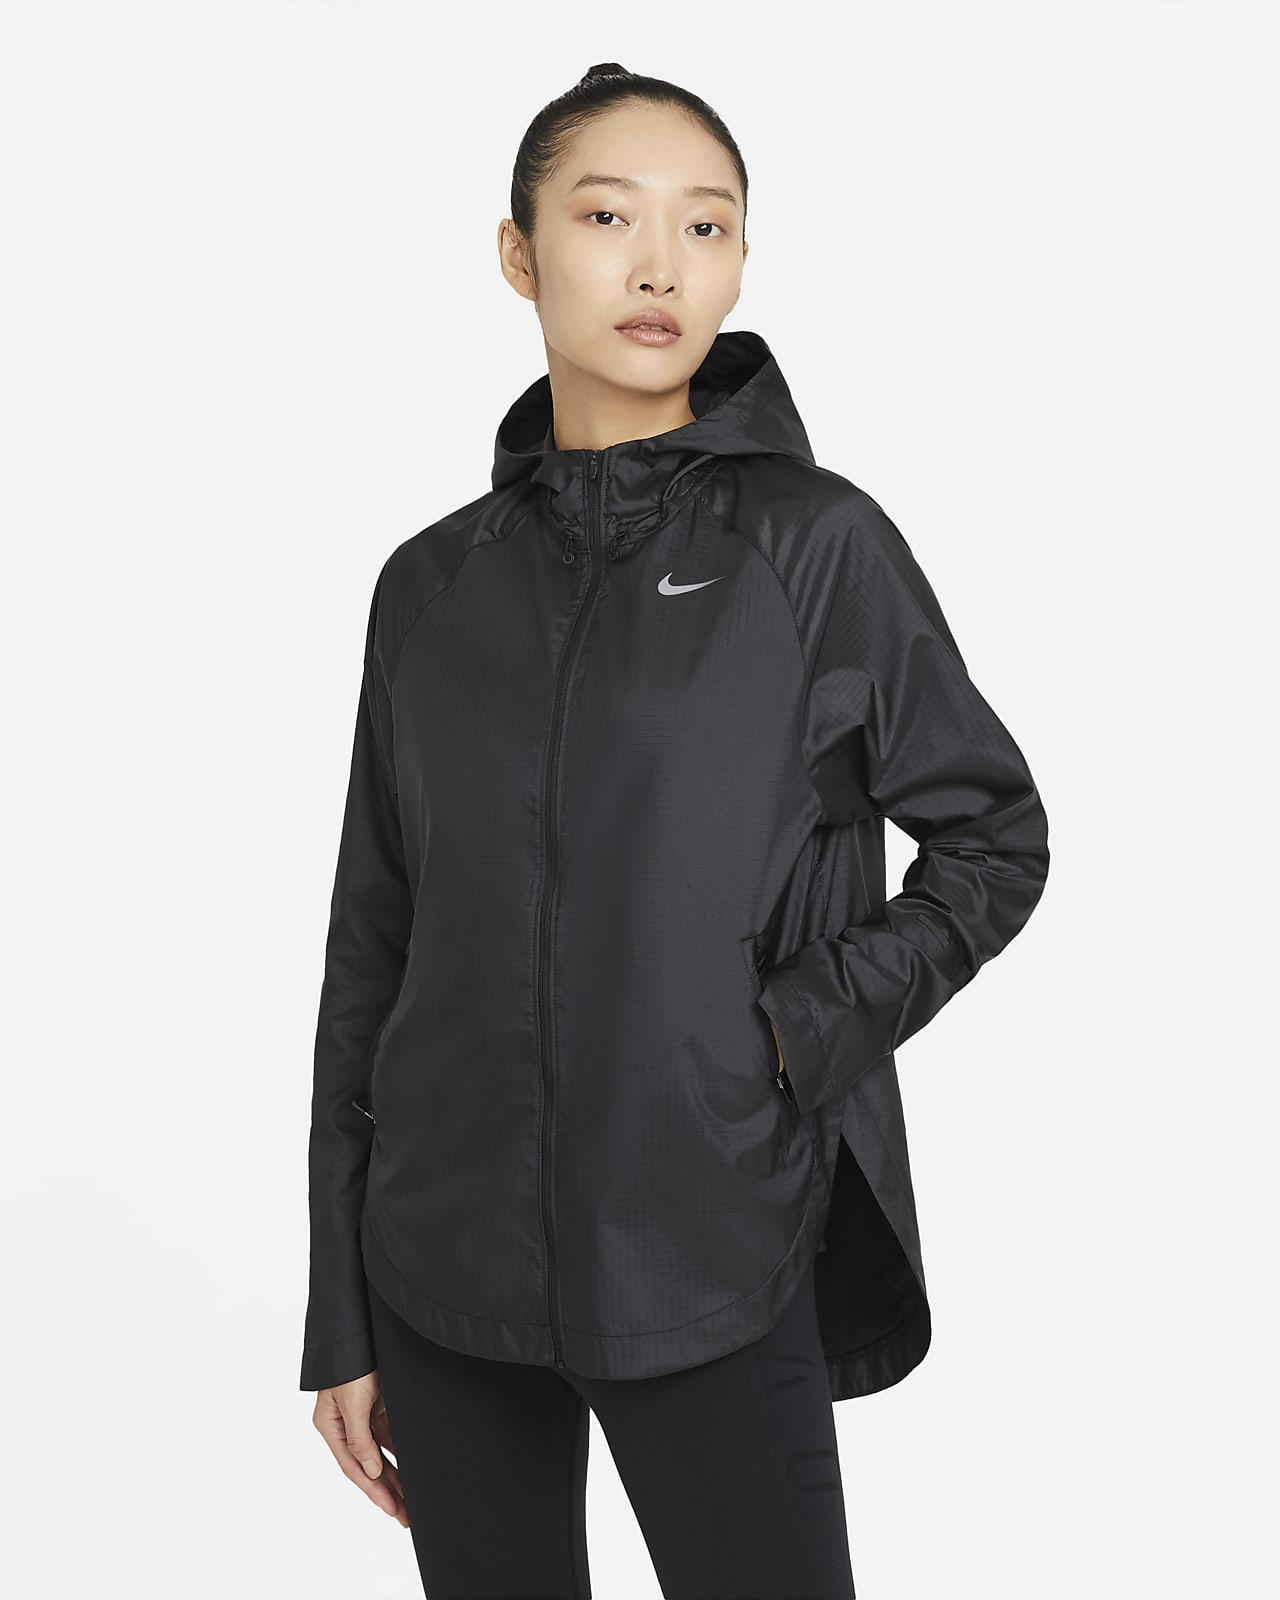 Casaco de running Nike Essential Run Division para mulher